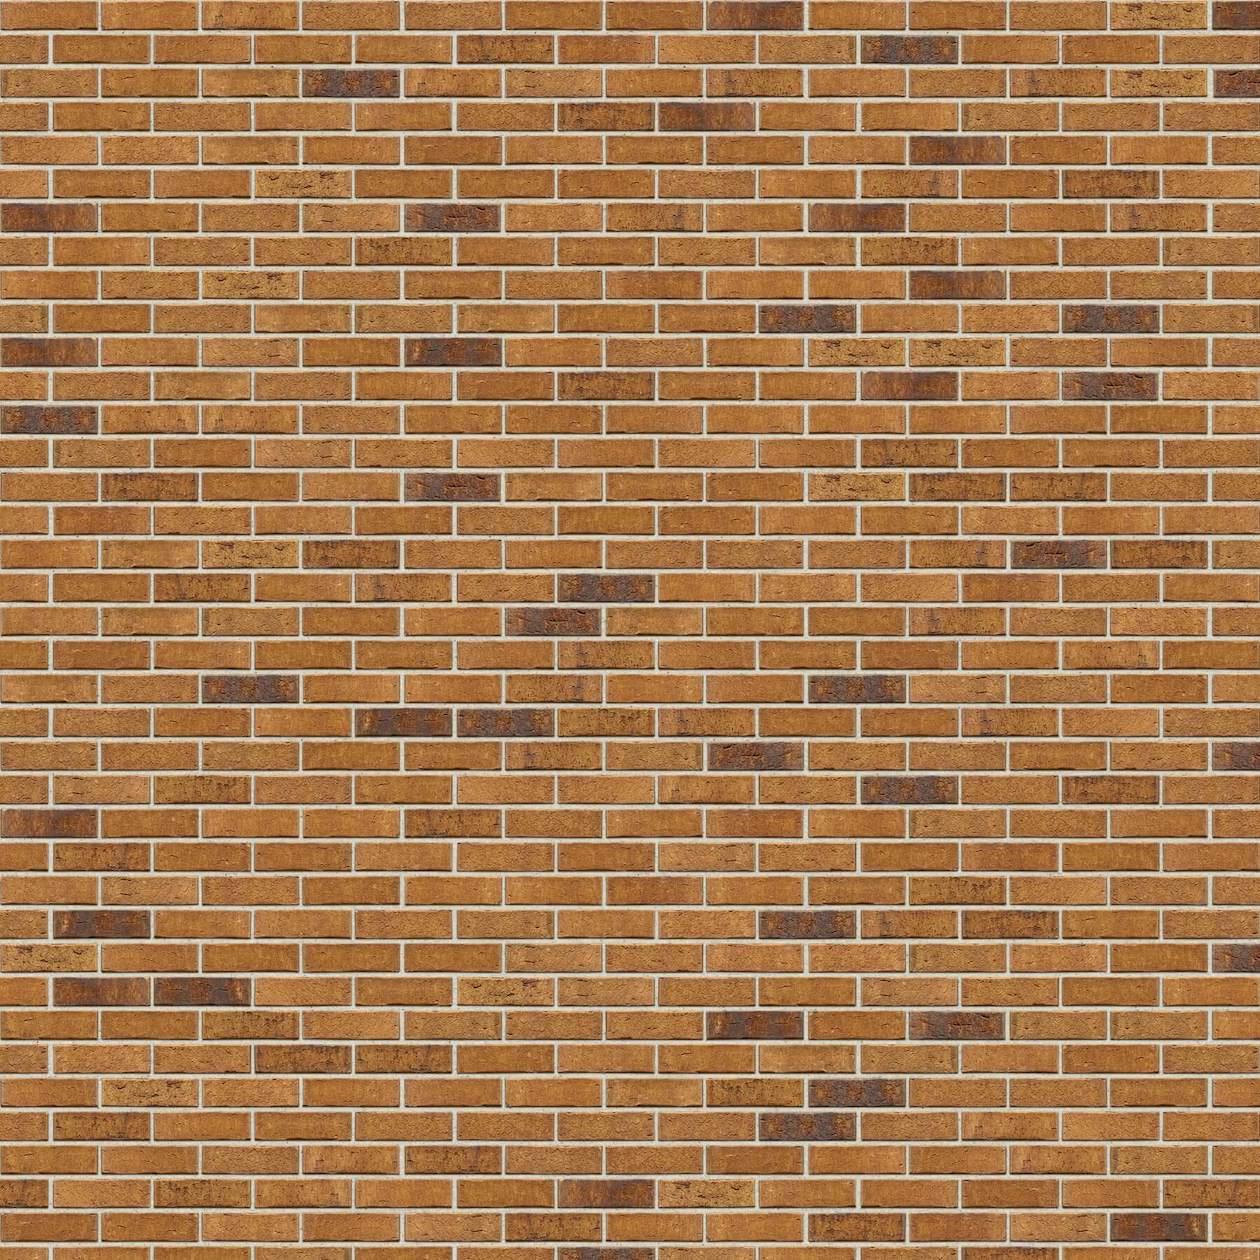 Puna-cigla-FeldHaus-Klinker-brick-house-nf-k-684-Bela Fuga